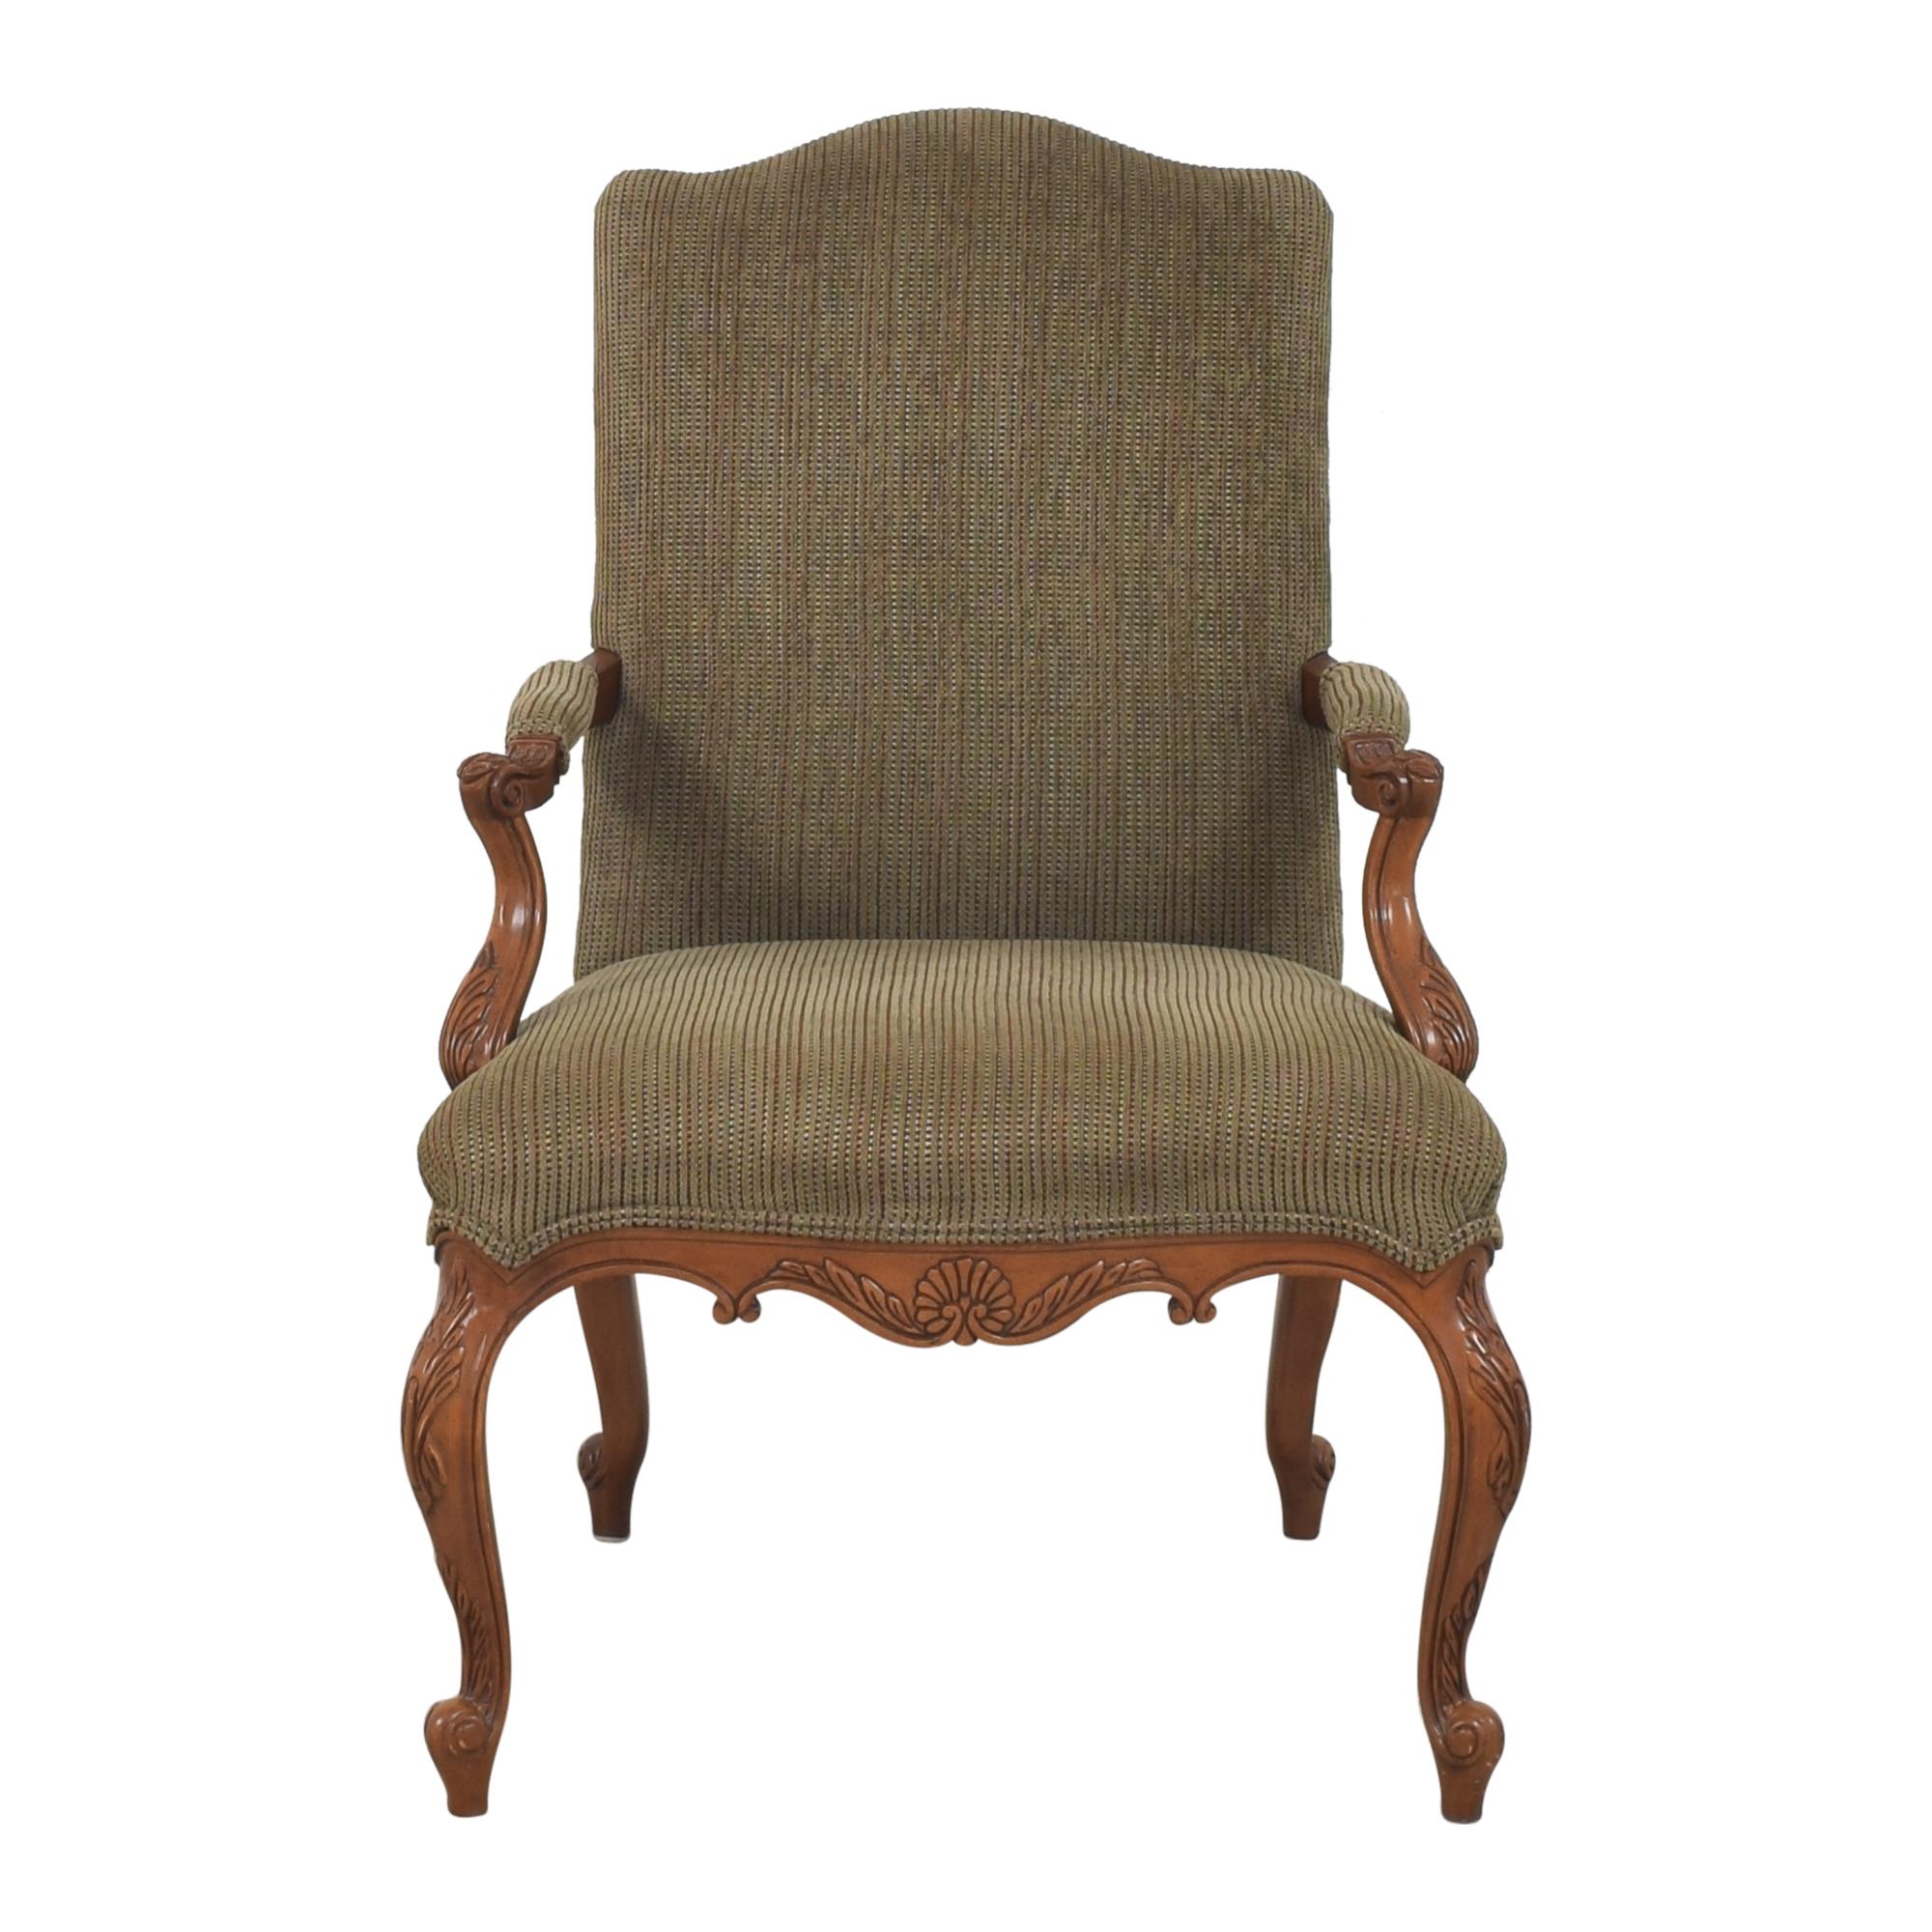 shop Drexel Heritage Accent Chair Drexel Heritage